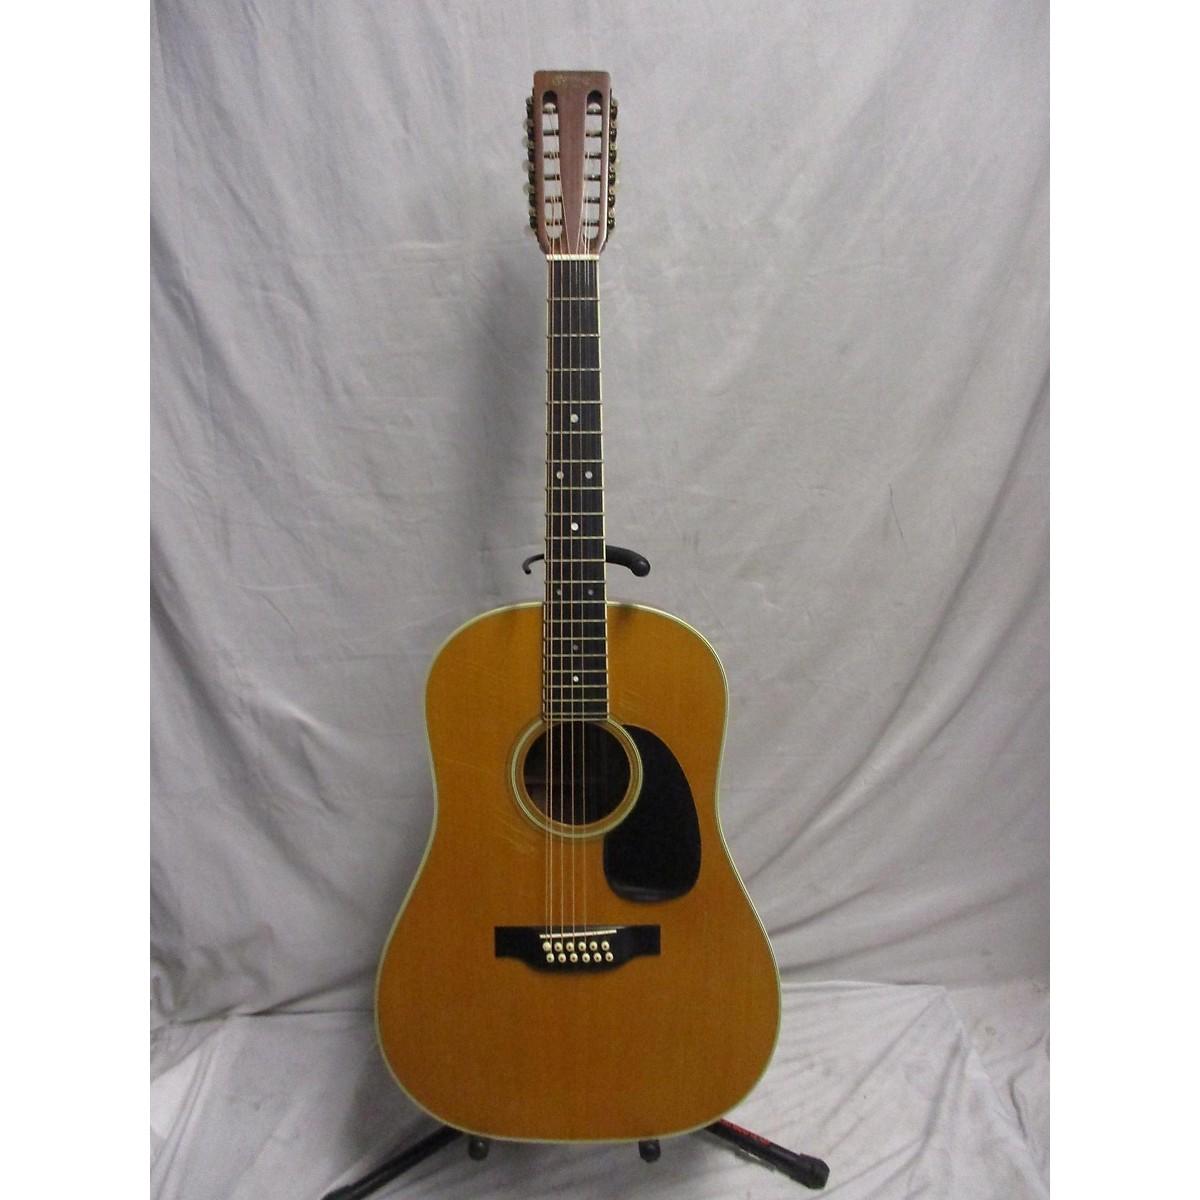 Martin 1975 D-12 35 12 String Acoustic Guitar